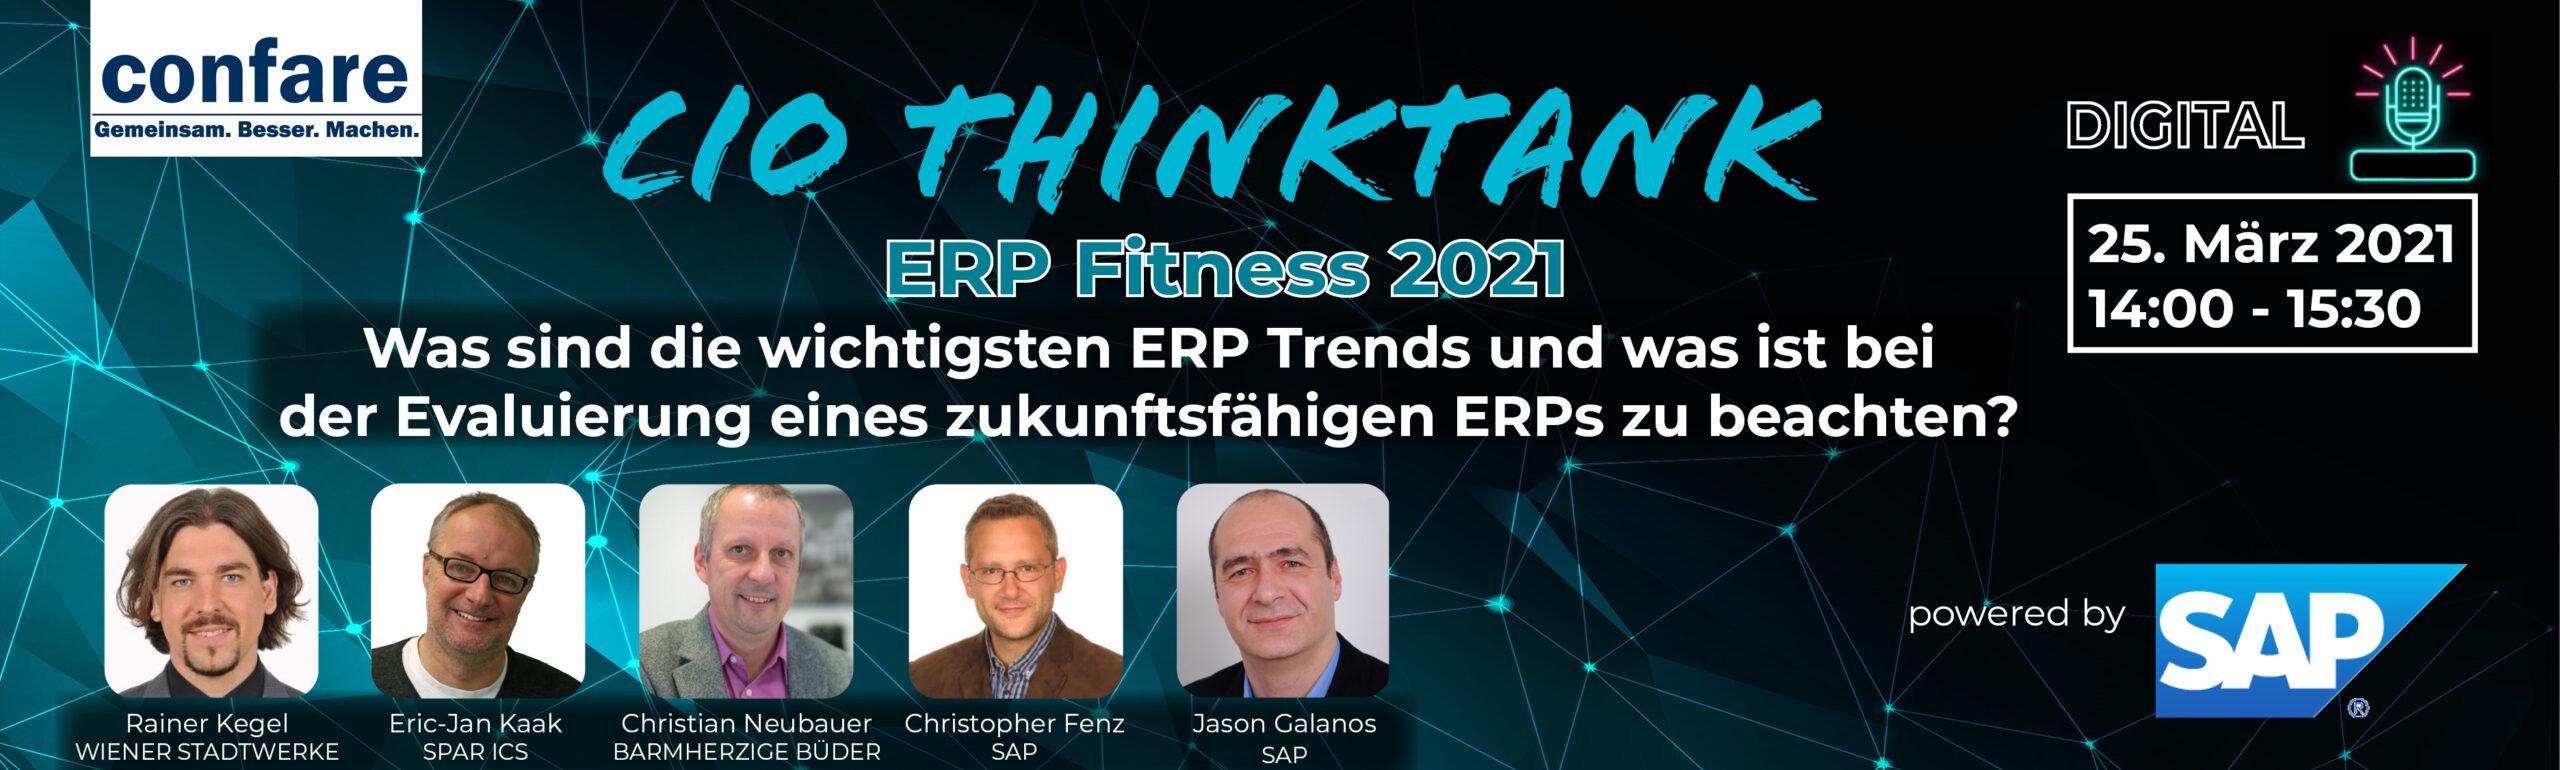 SAP Webcast ThinkTank